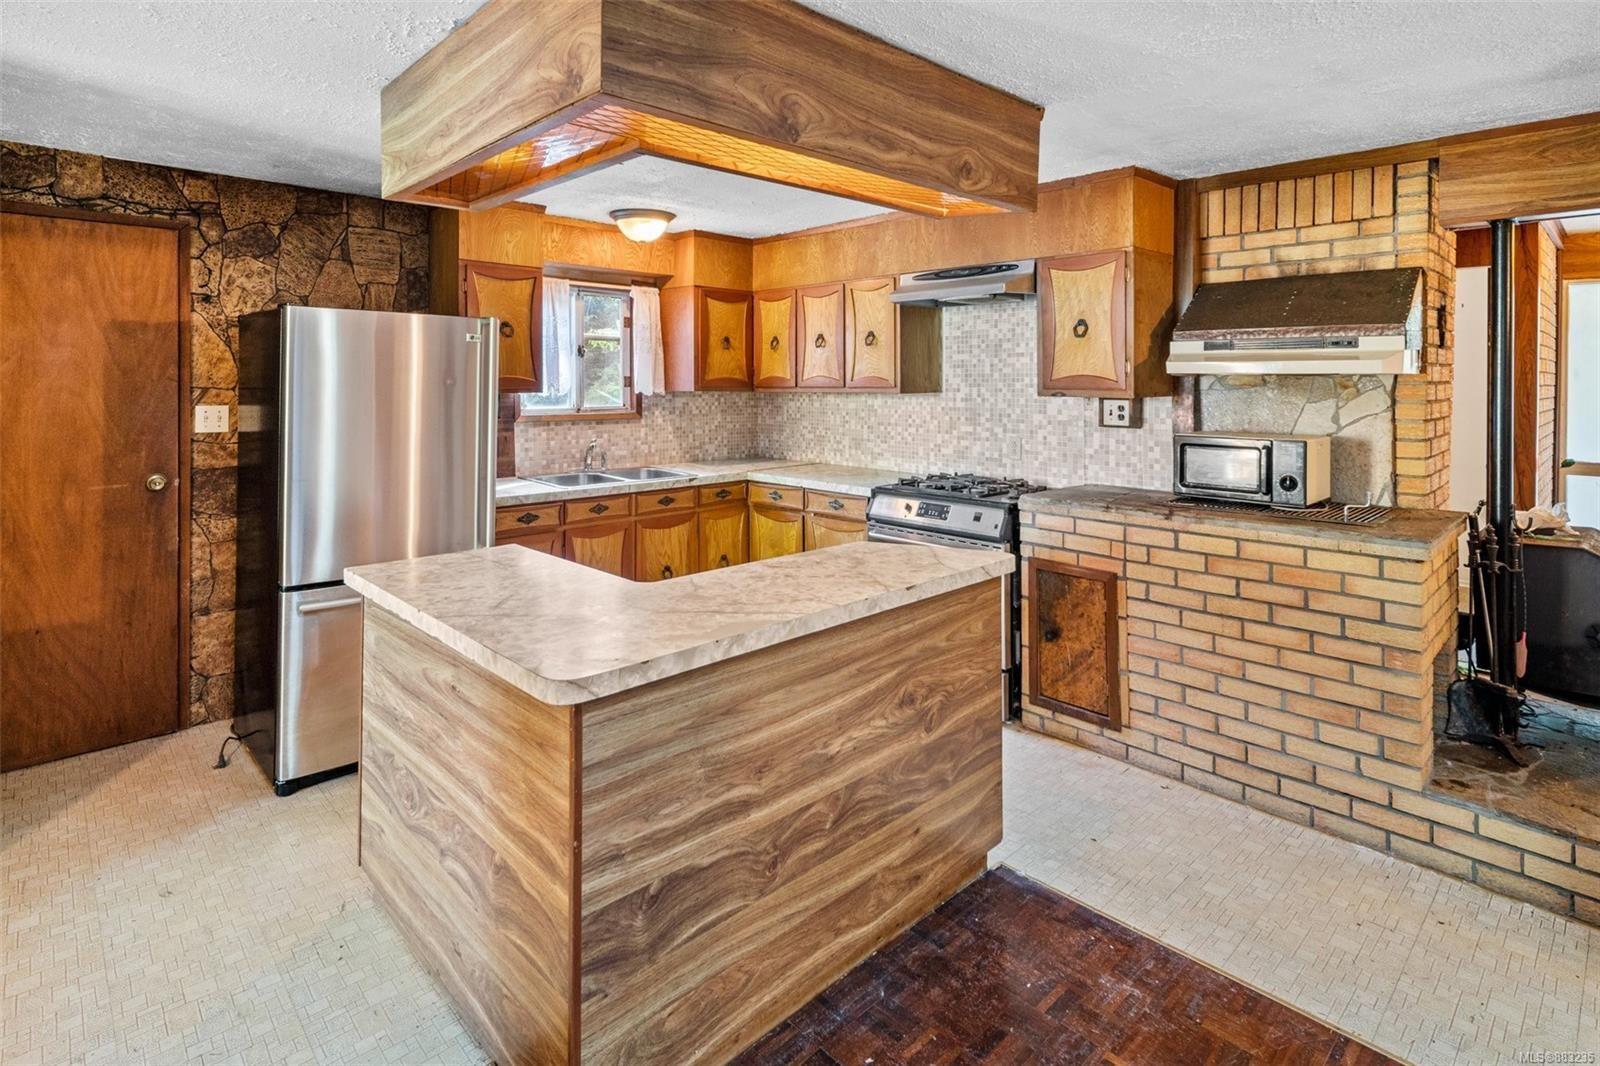 Photo 17: Photos: 6542 Thornett Rd in : Sk East Sooke House for sale (Sooke)  : MLS®# 883235